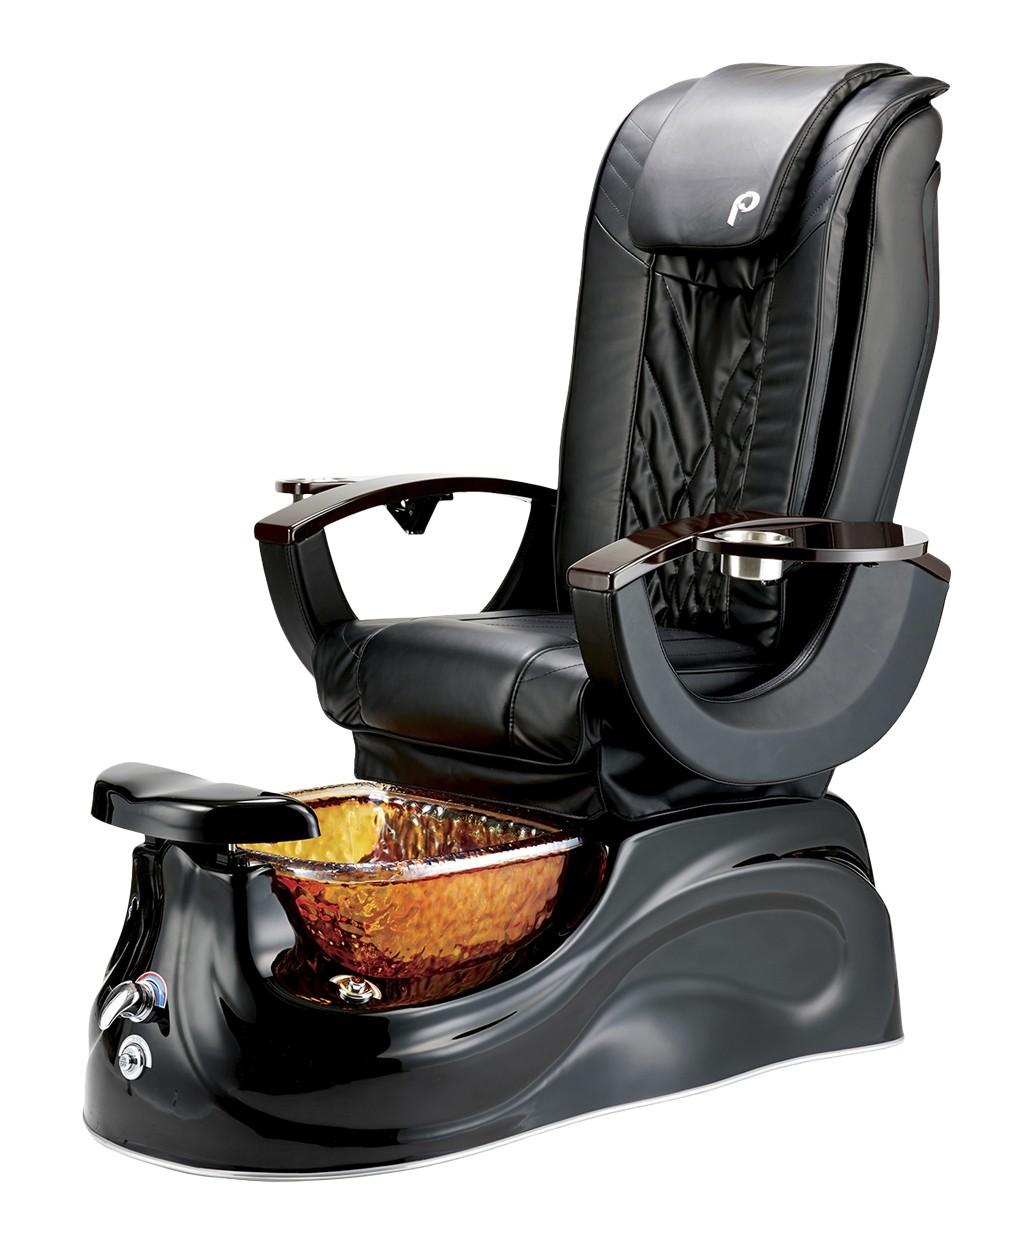 Pibbs PS65 San Marino Pipeless Pedicure Spa w/ Glass Bowl & Shiatsu